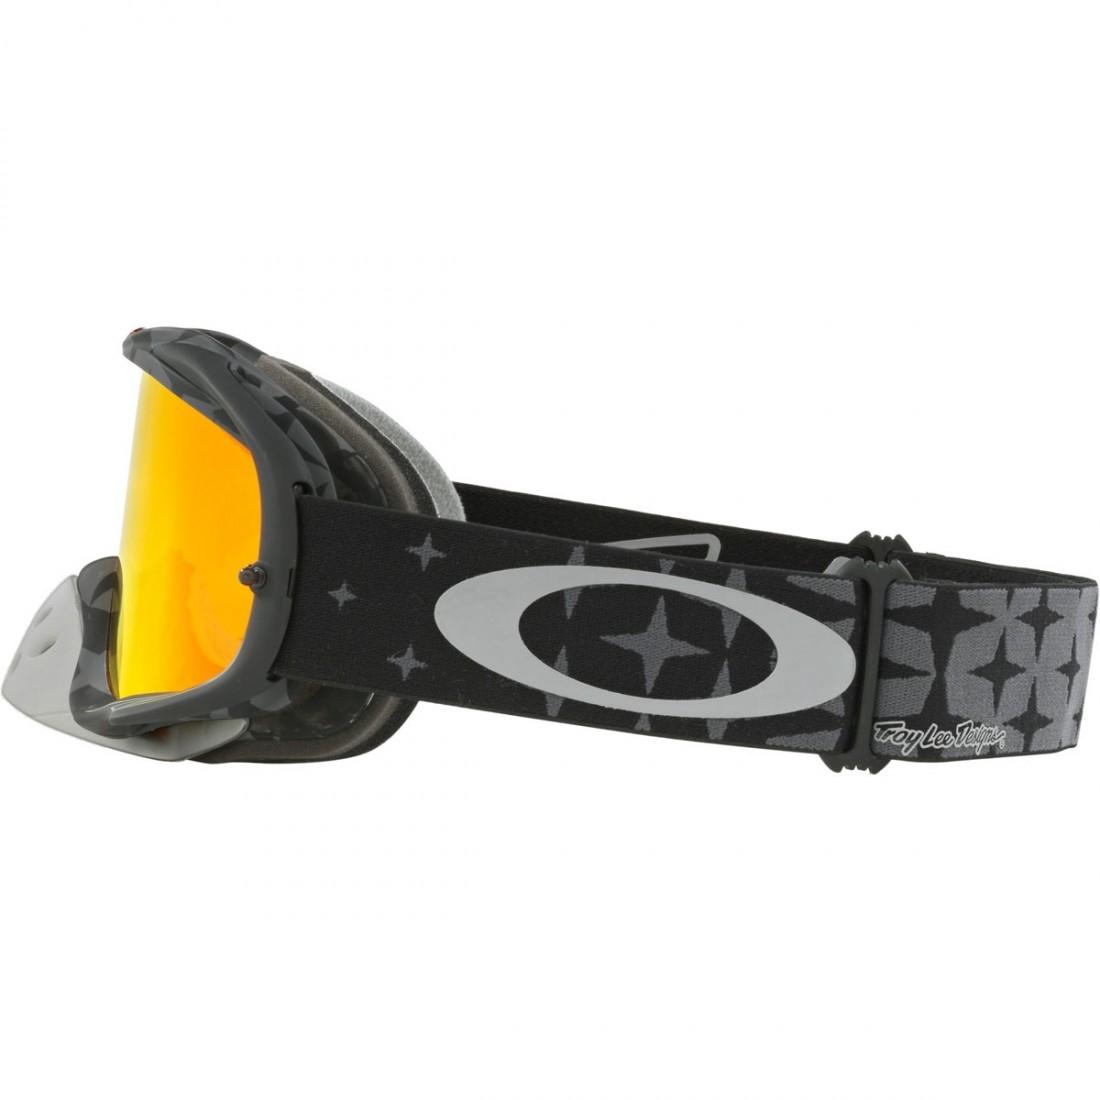 01b742fb86 OAKLEY Crowbar MX Troy Lee Designs Series Megaburst Black   Fire Iridium  Goggles